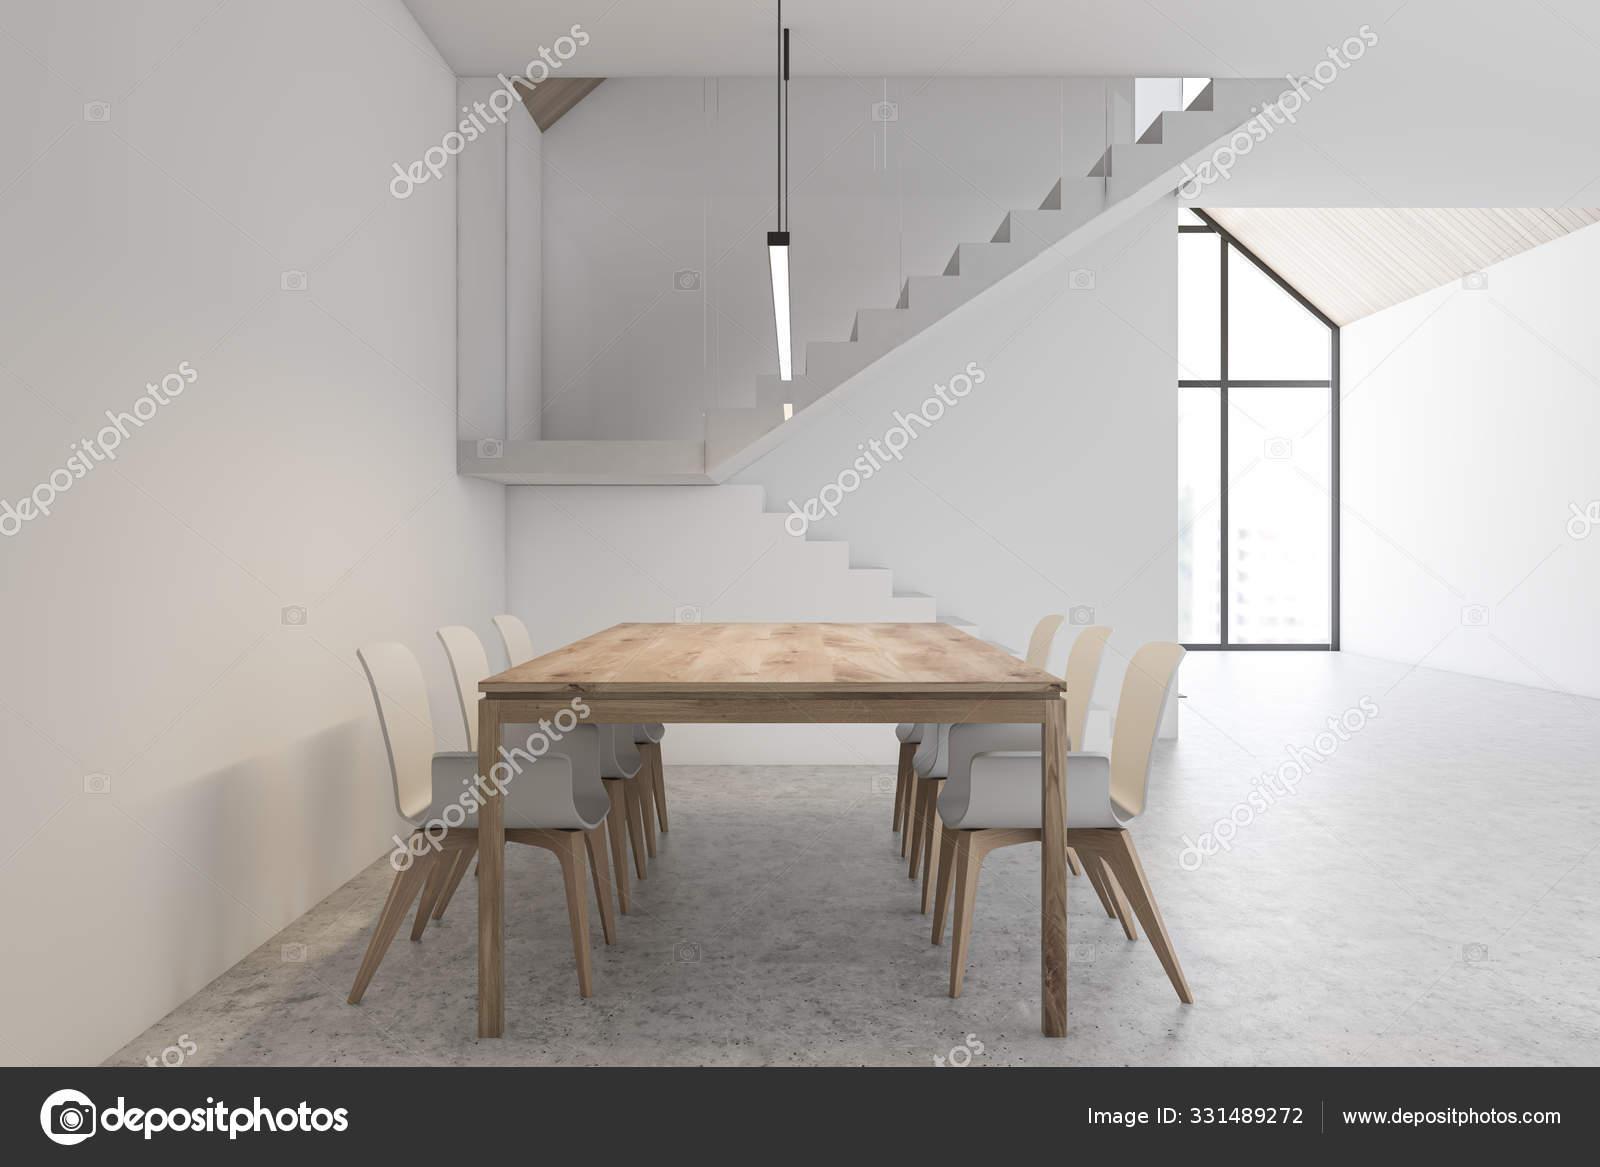 White Dining Room Interior With Stairs Stock Photo C Denisismagilov 331489272